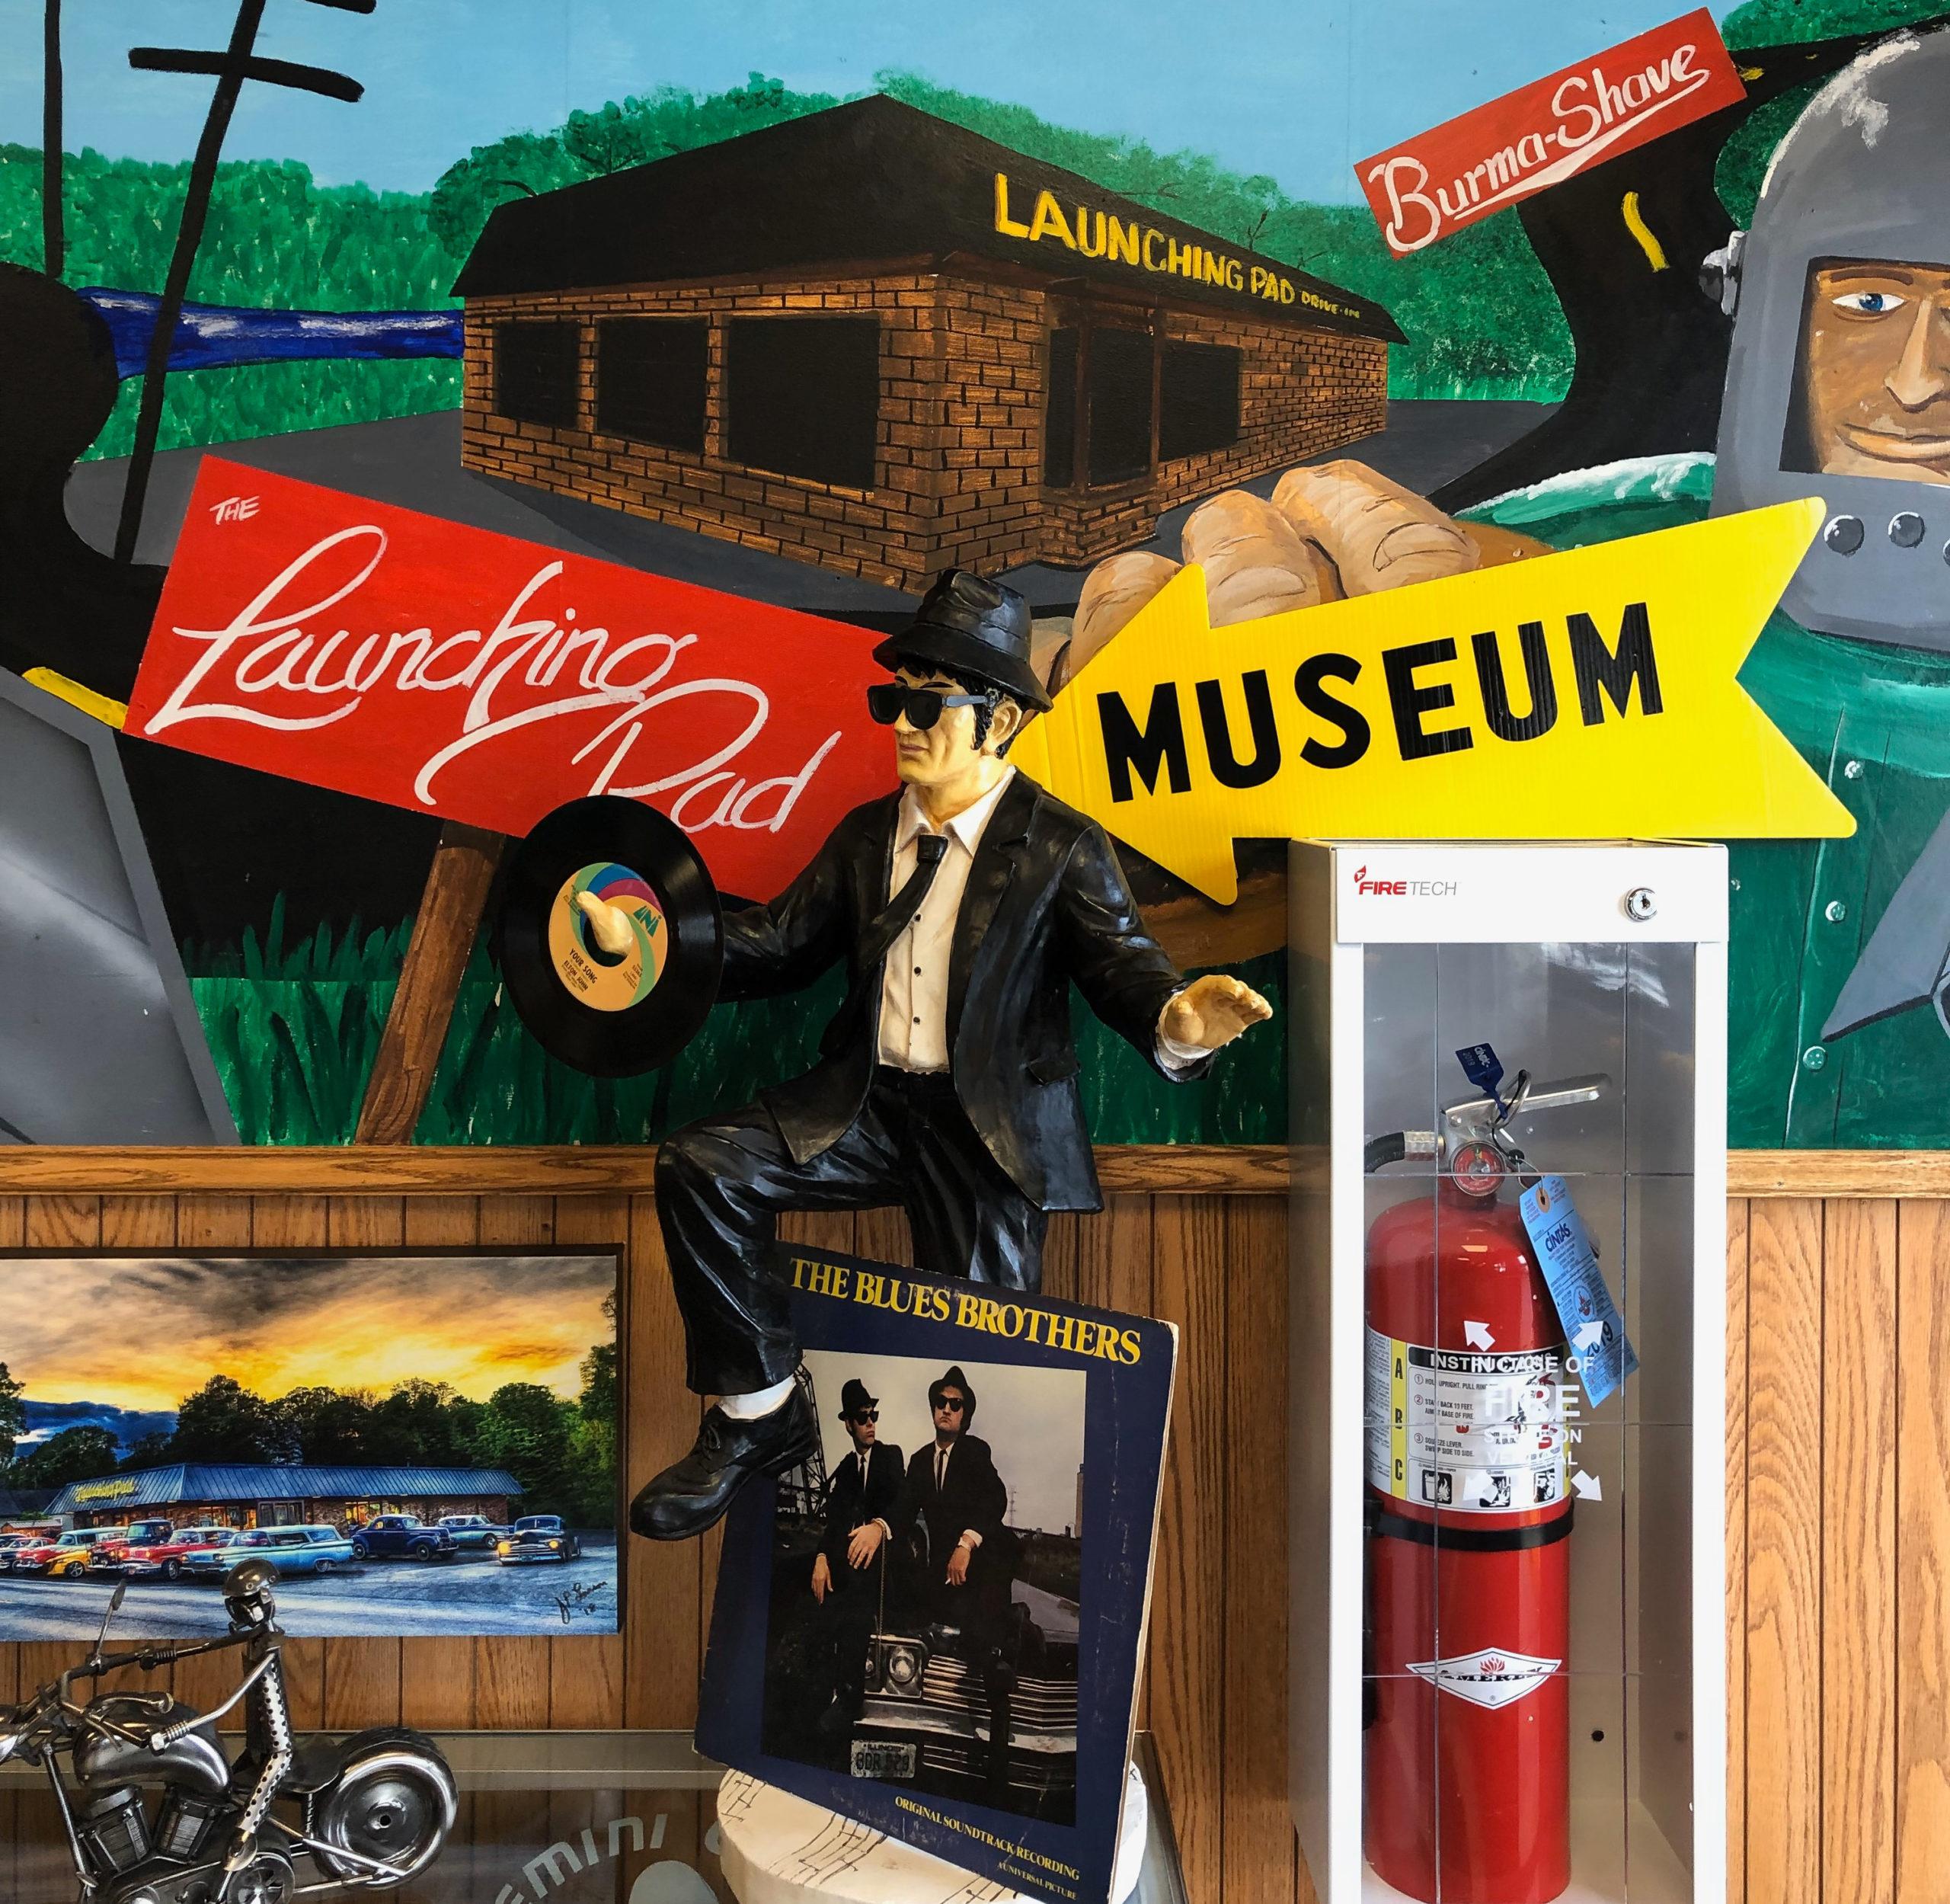 Das hauseigene Museum über dei Route 66 im Restaurant The Launching Pad in Wilmington Illinois mit Elwood Blues